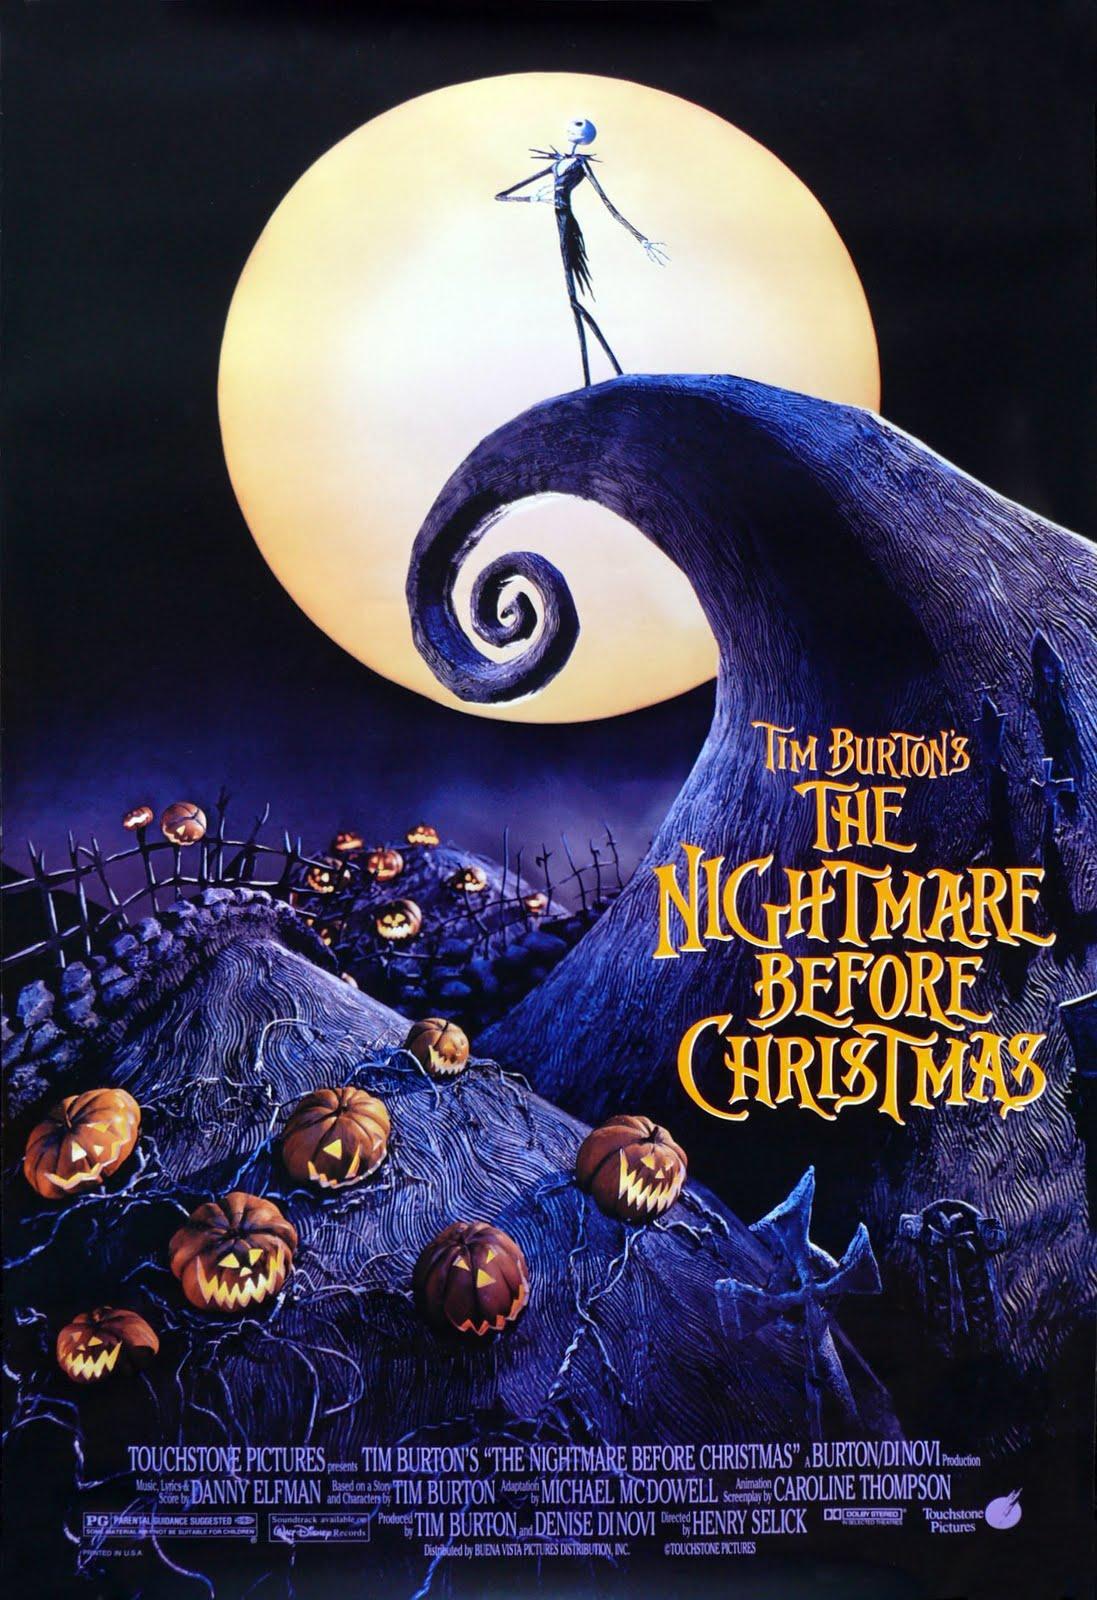 http://2.bp.blogspot.com/-yYDpRTkJPBU/Tcm4LiSds1I/AAAAAAAAAN4/AA9igz1lzlk/s1600/the_nightmare_before_christmas_poster.jpg